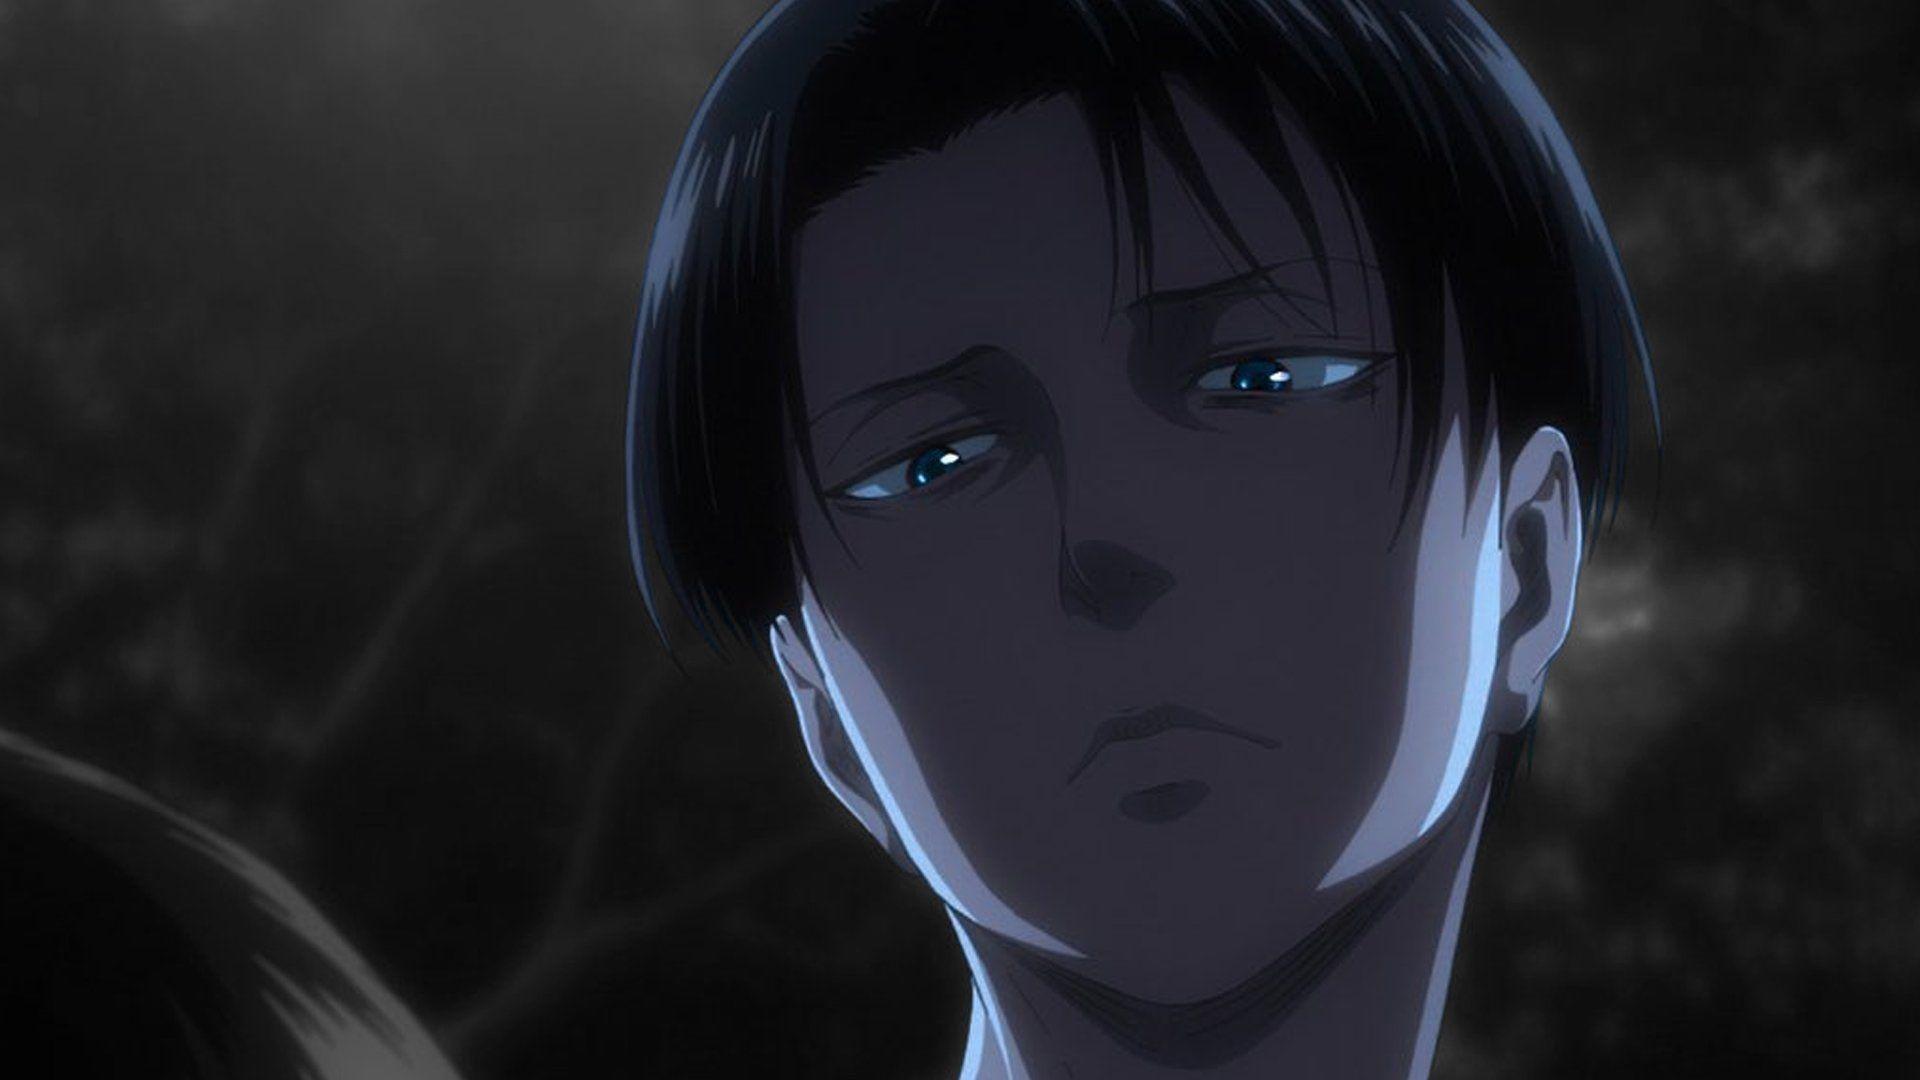 Anime Boy Listening To Music Gif